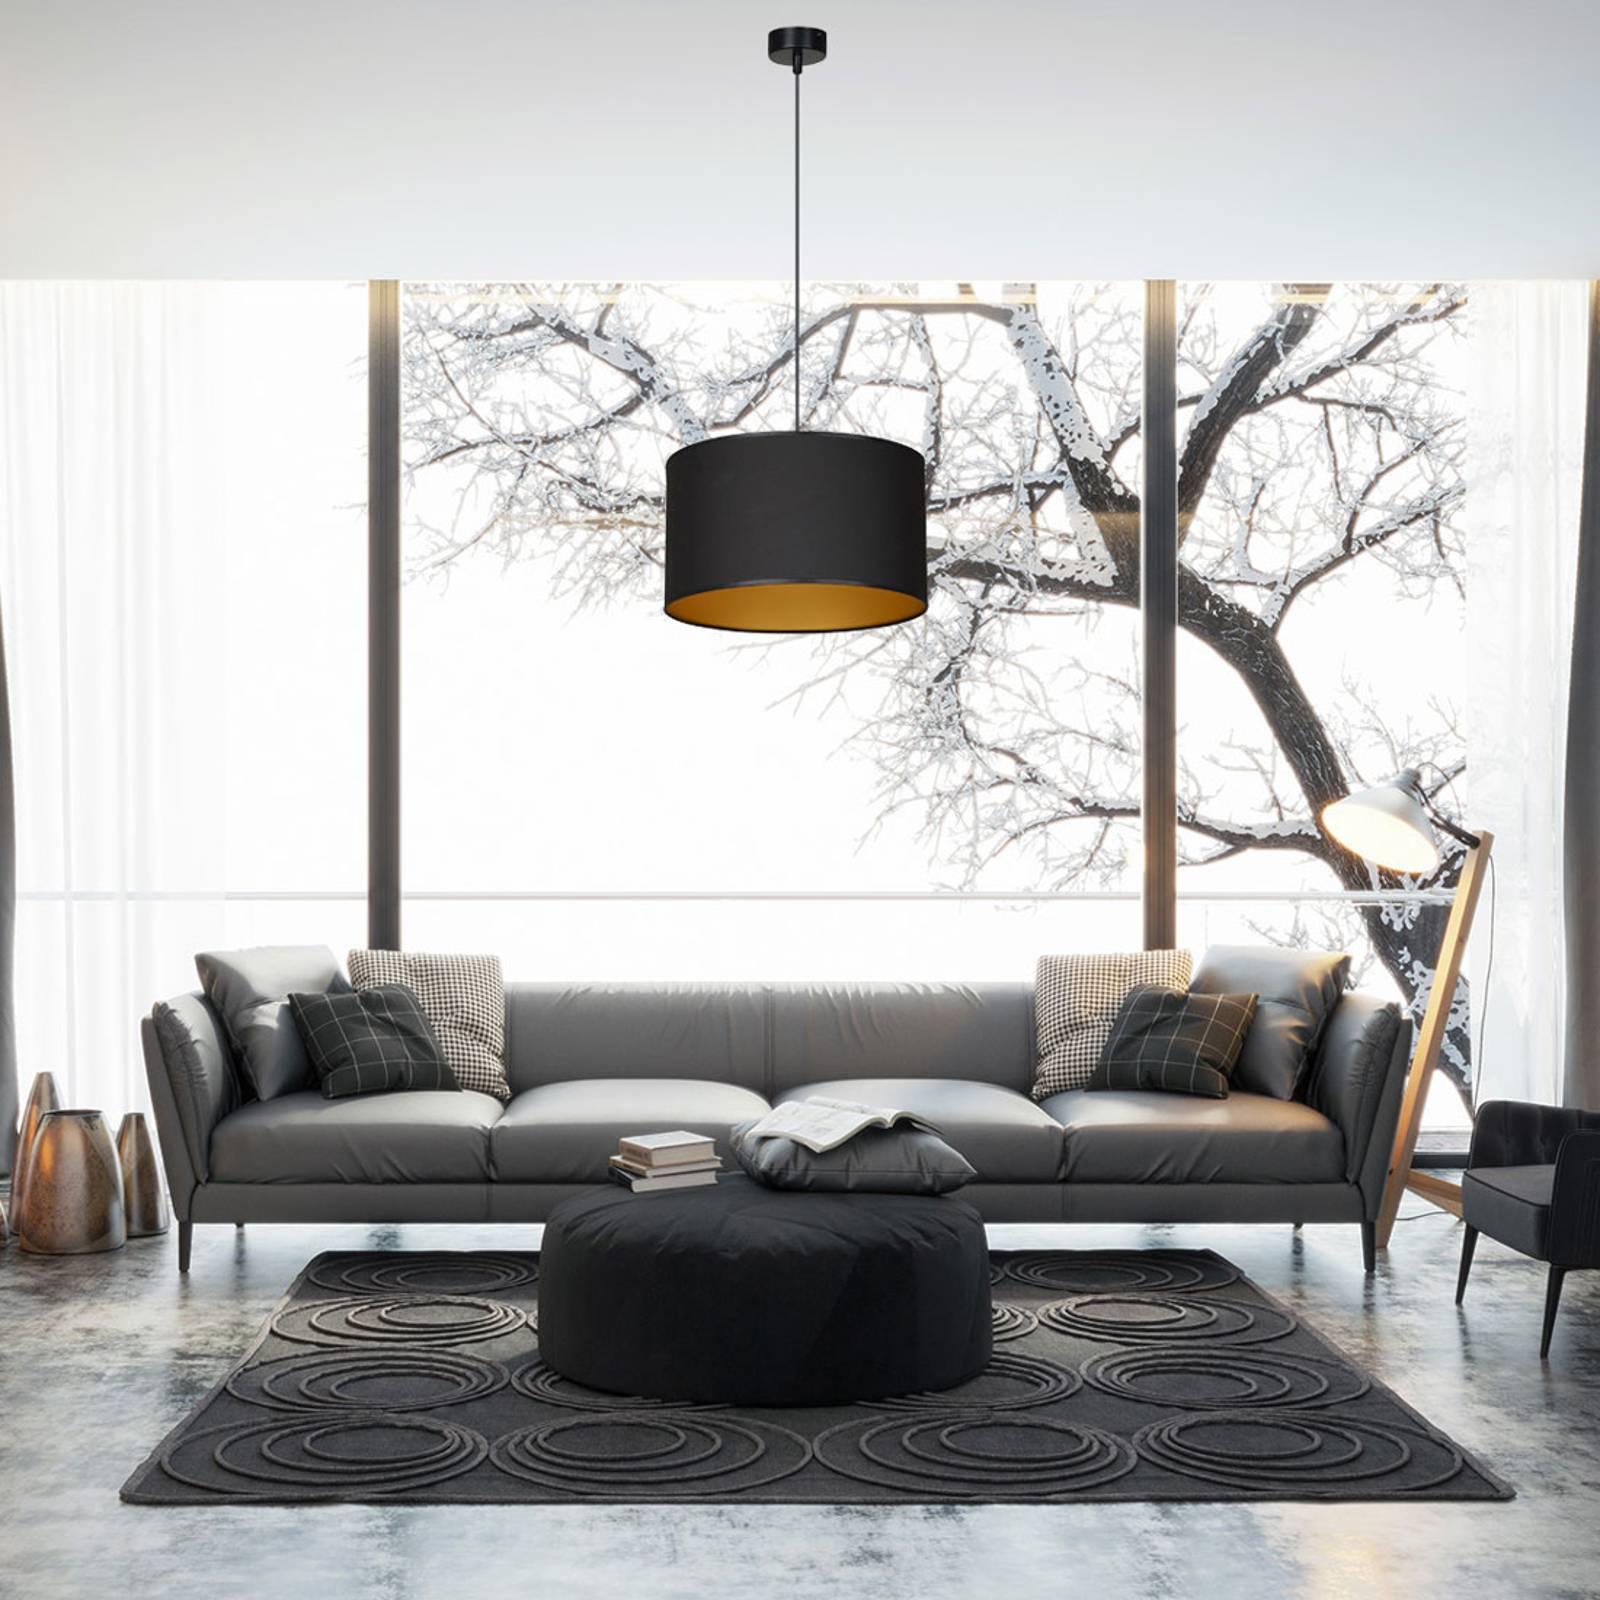 Hanglamp Roto 1 in zwart, kap binnen goud